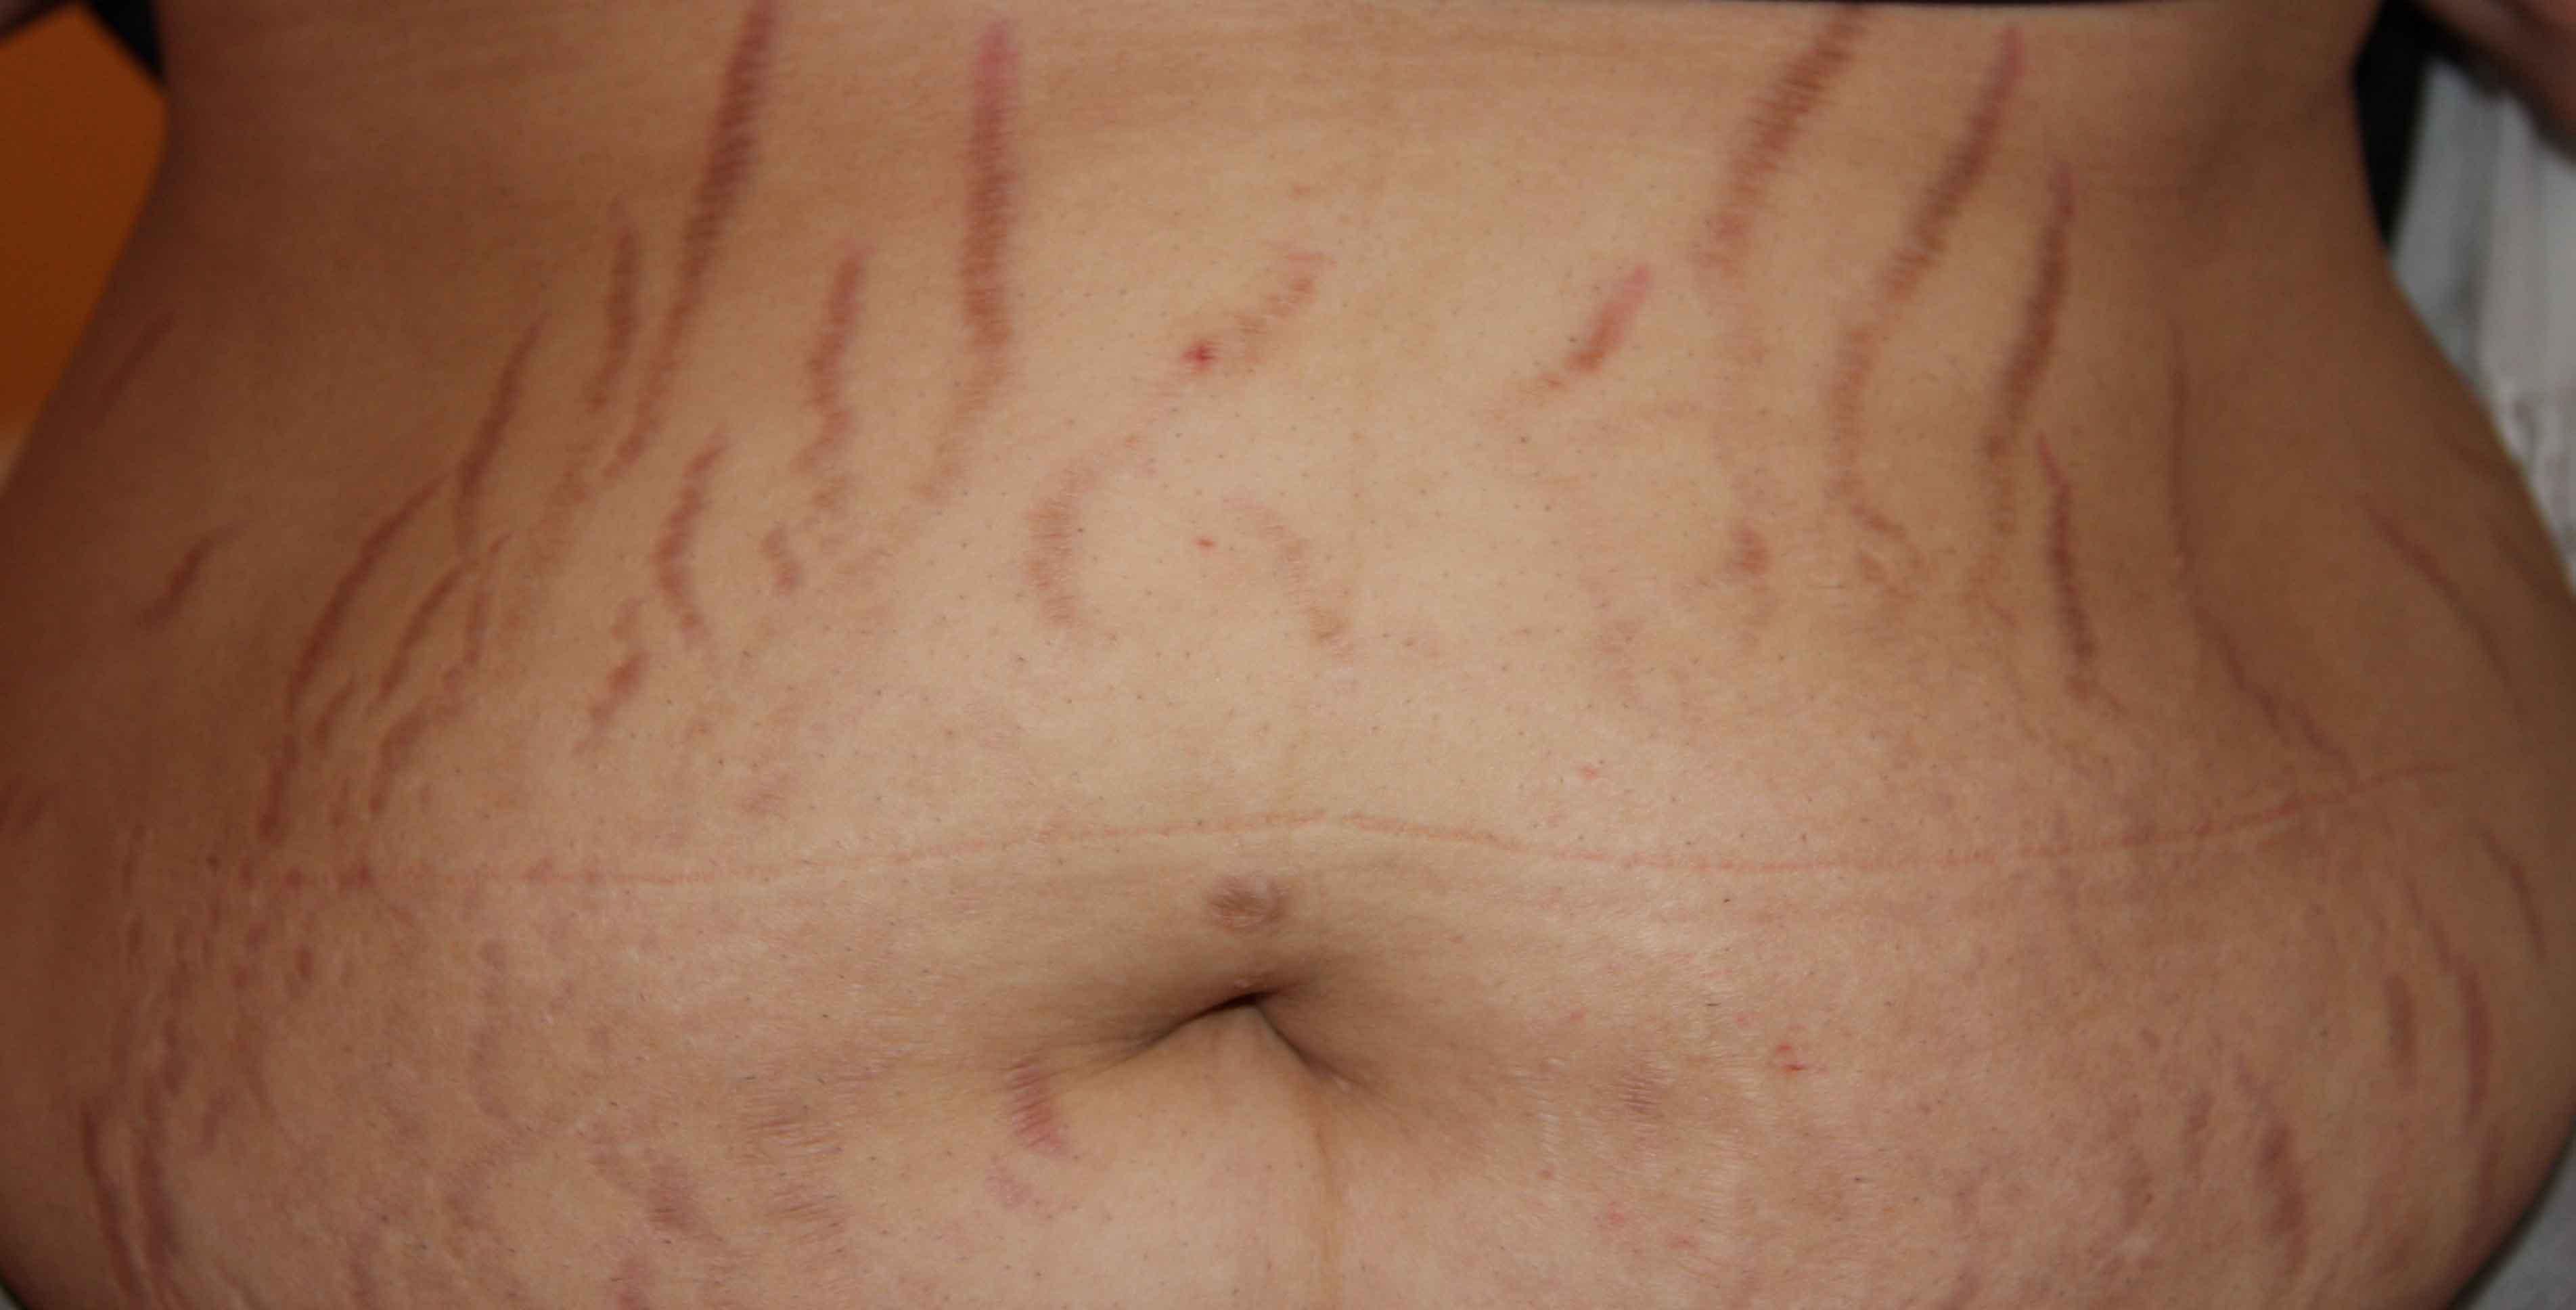 Strerch marks